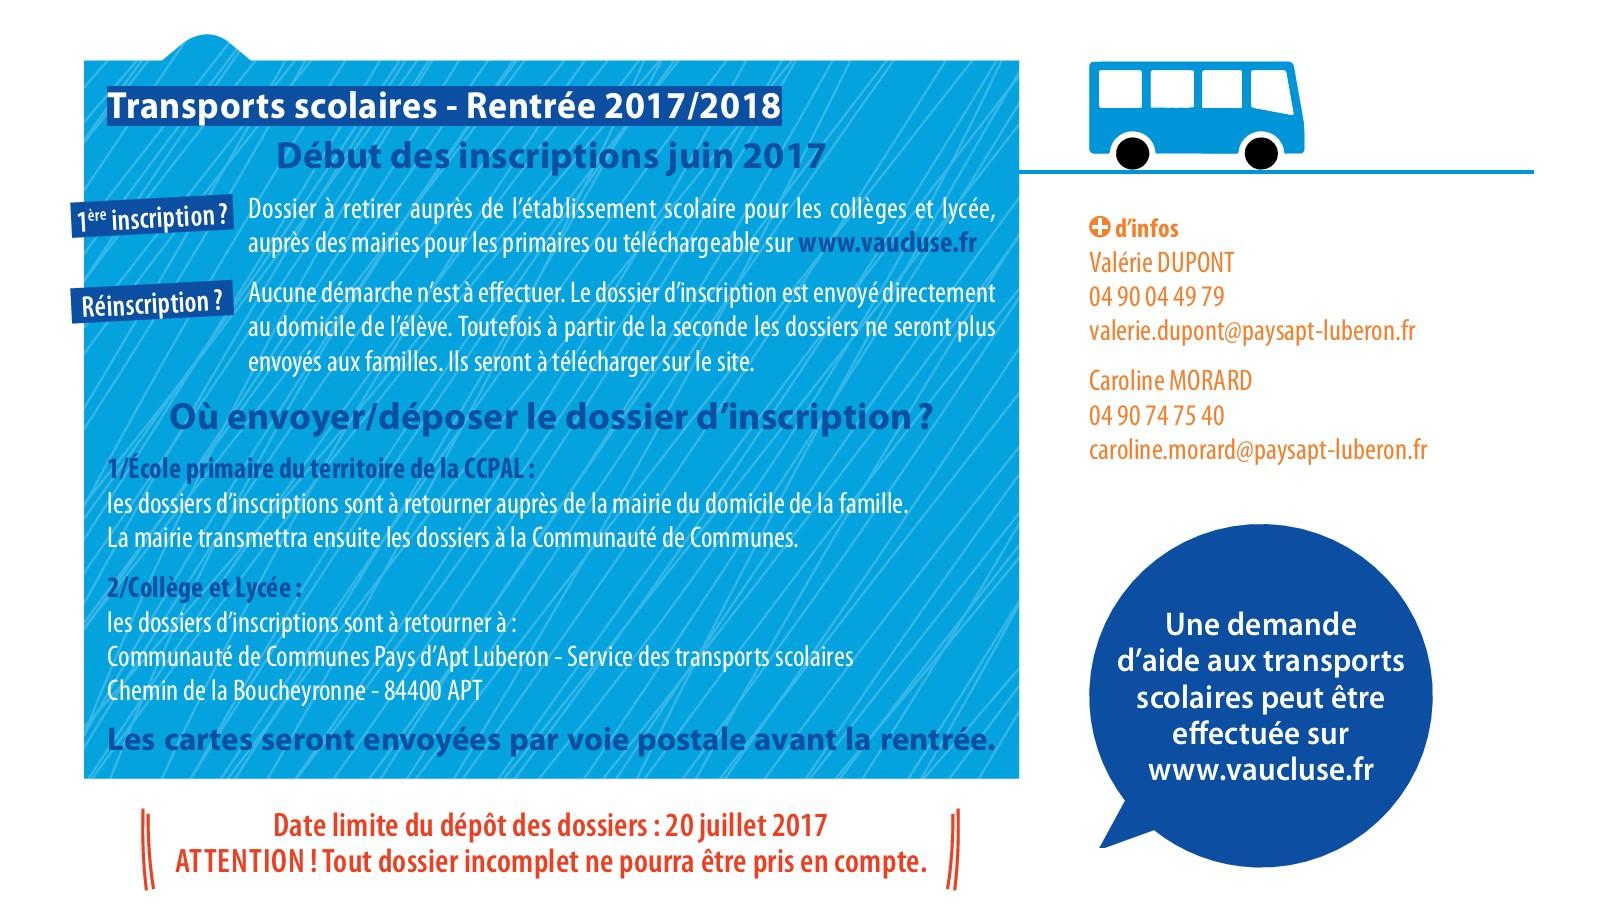 Transport sco - 2017 - 2018 - CCPAL